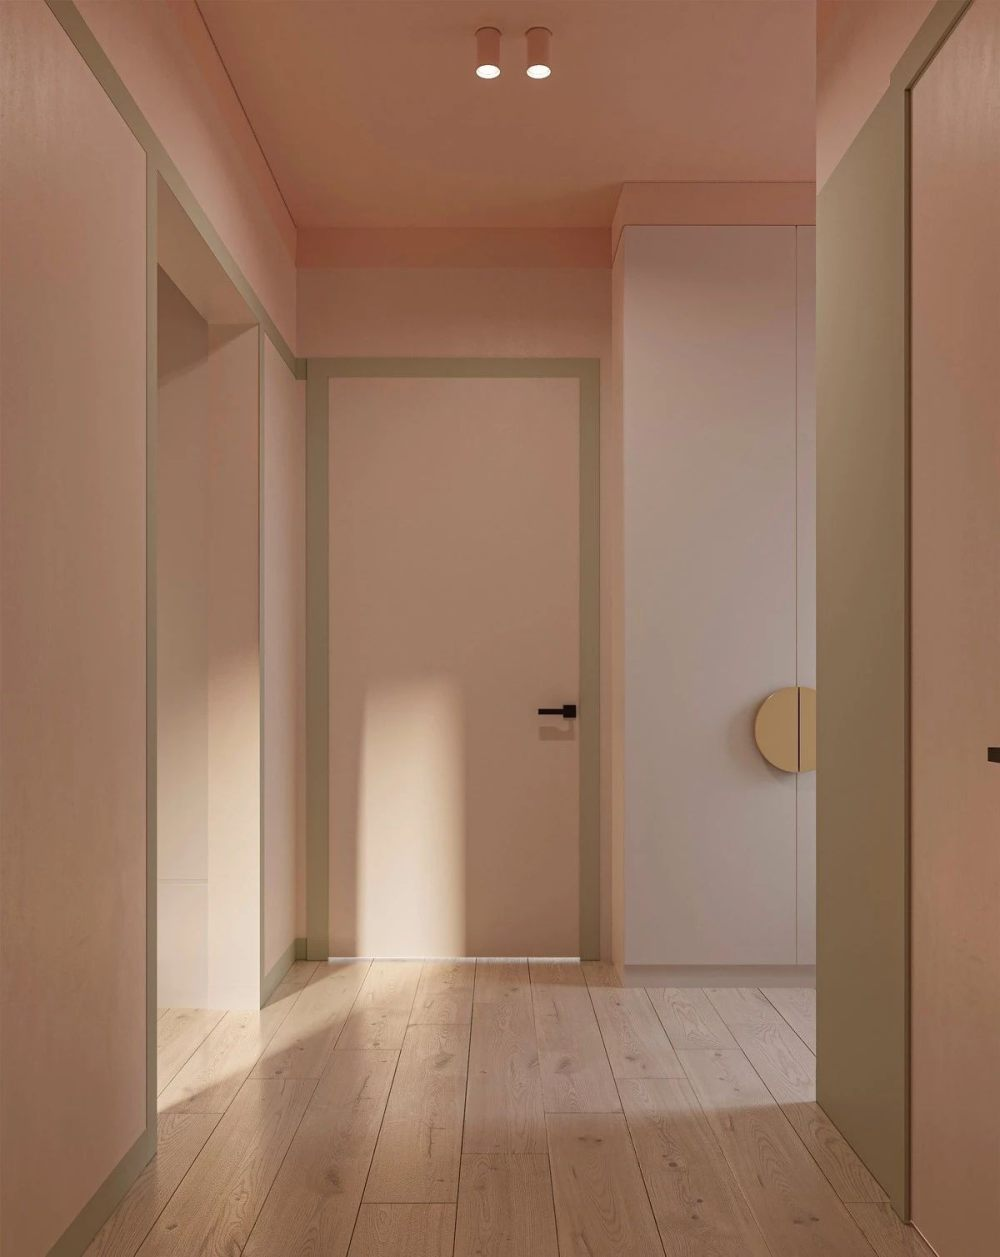 【ZROBYM architects】白俄罗斯明斯克州 高颜值、高质感住宅  _白俄罗斯明斯克州高颜值、高质感住宅22.jpg